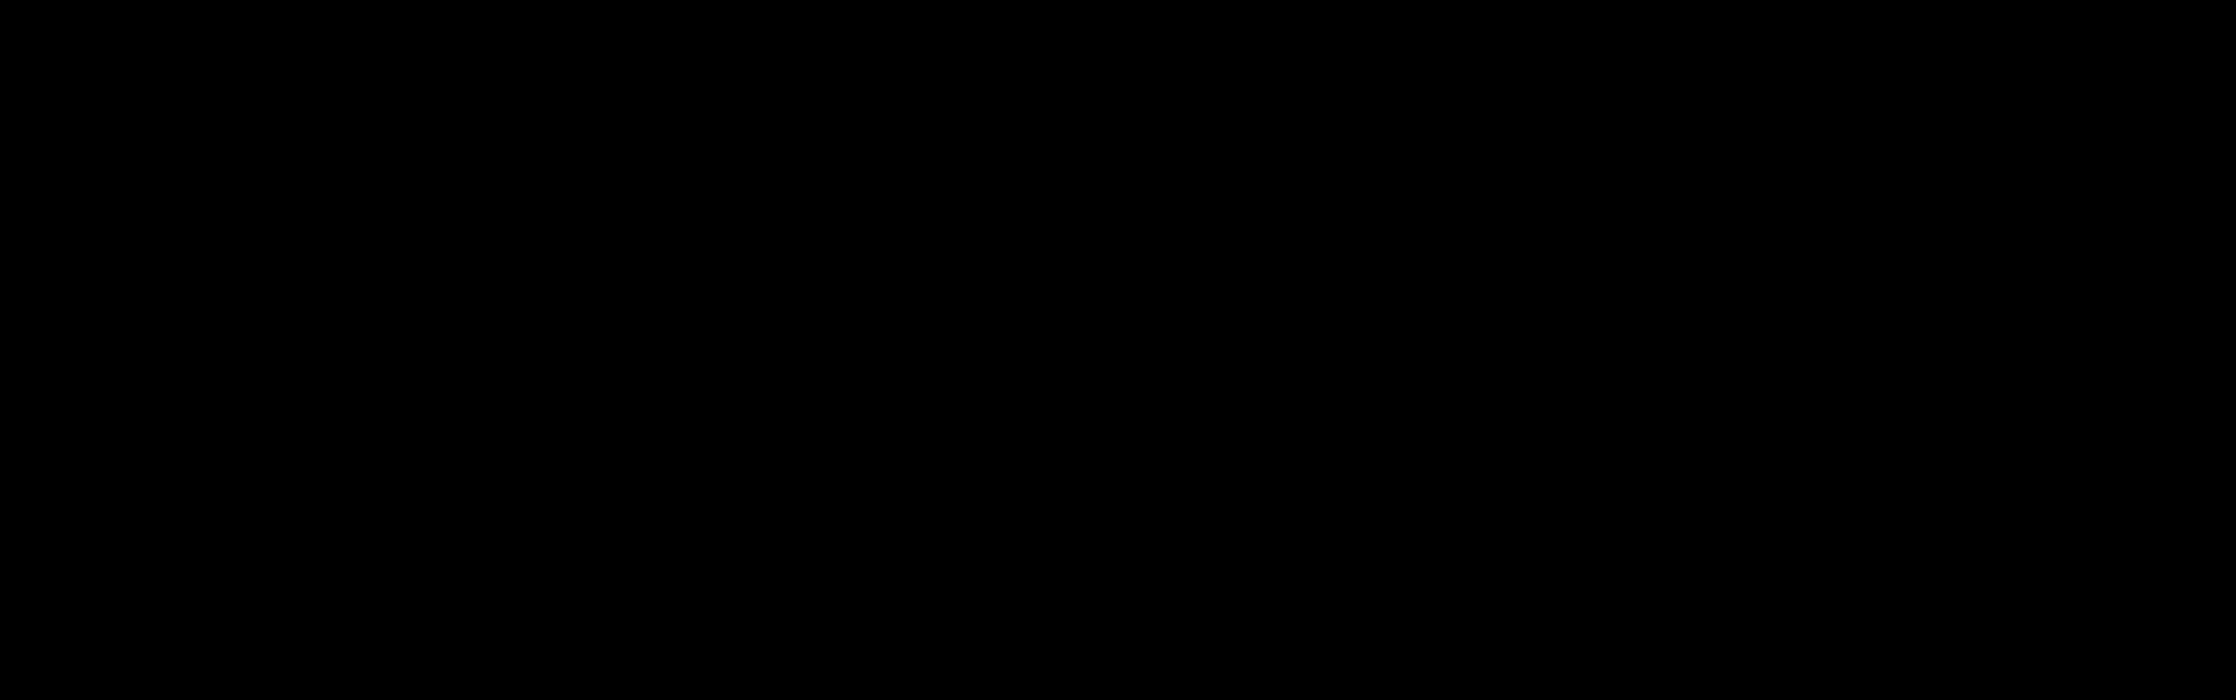 (E)-N-(4-Methoxy-d<sub>3</sub> 3,5-dimethoxyphenyl)-3-(3-(3,4,5-trimethoxyphenyl)-1H-pyrazol-5-yl)acrylamide